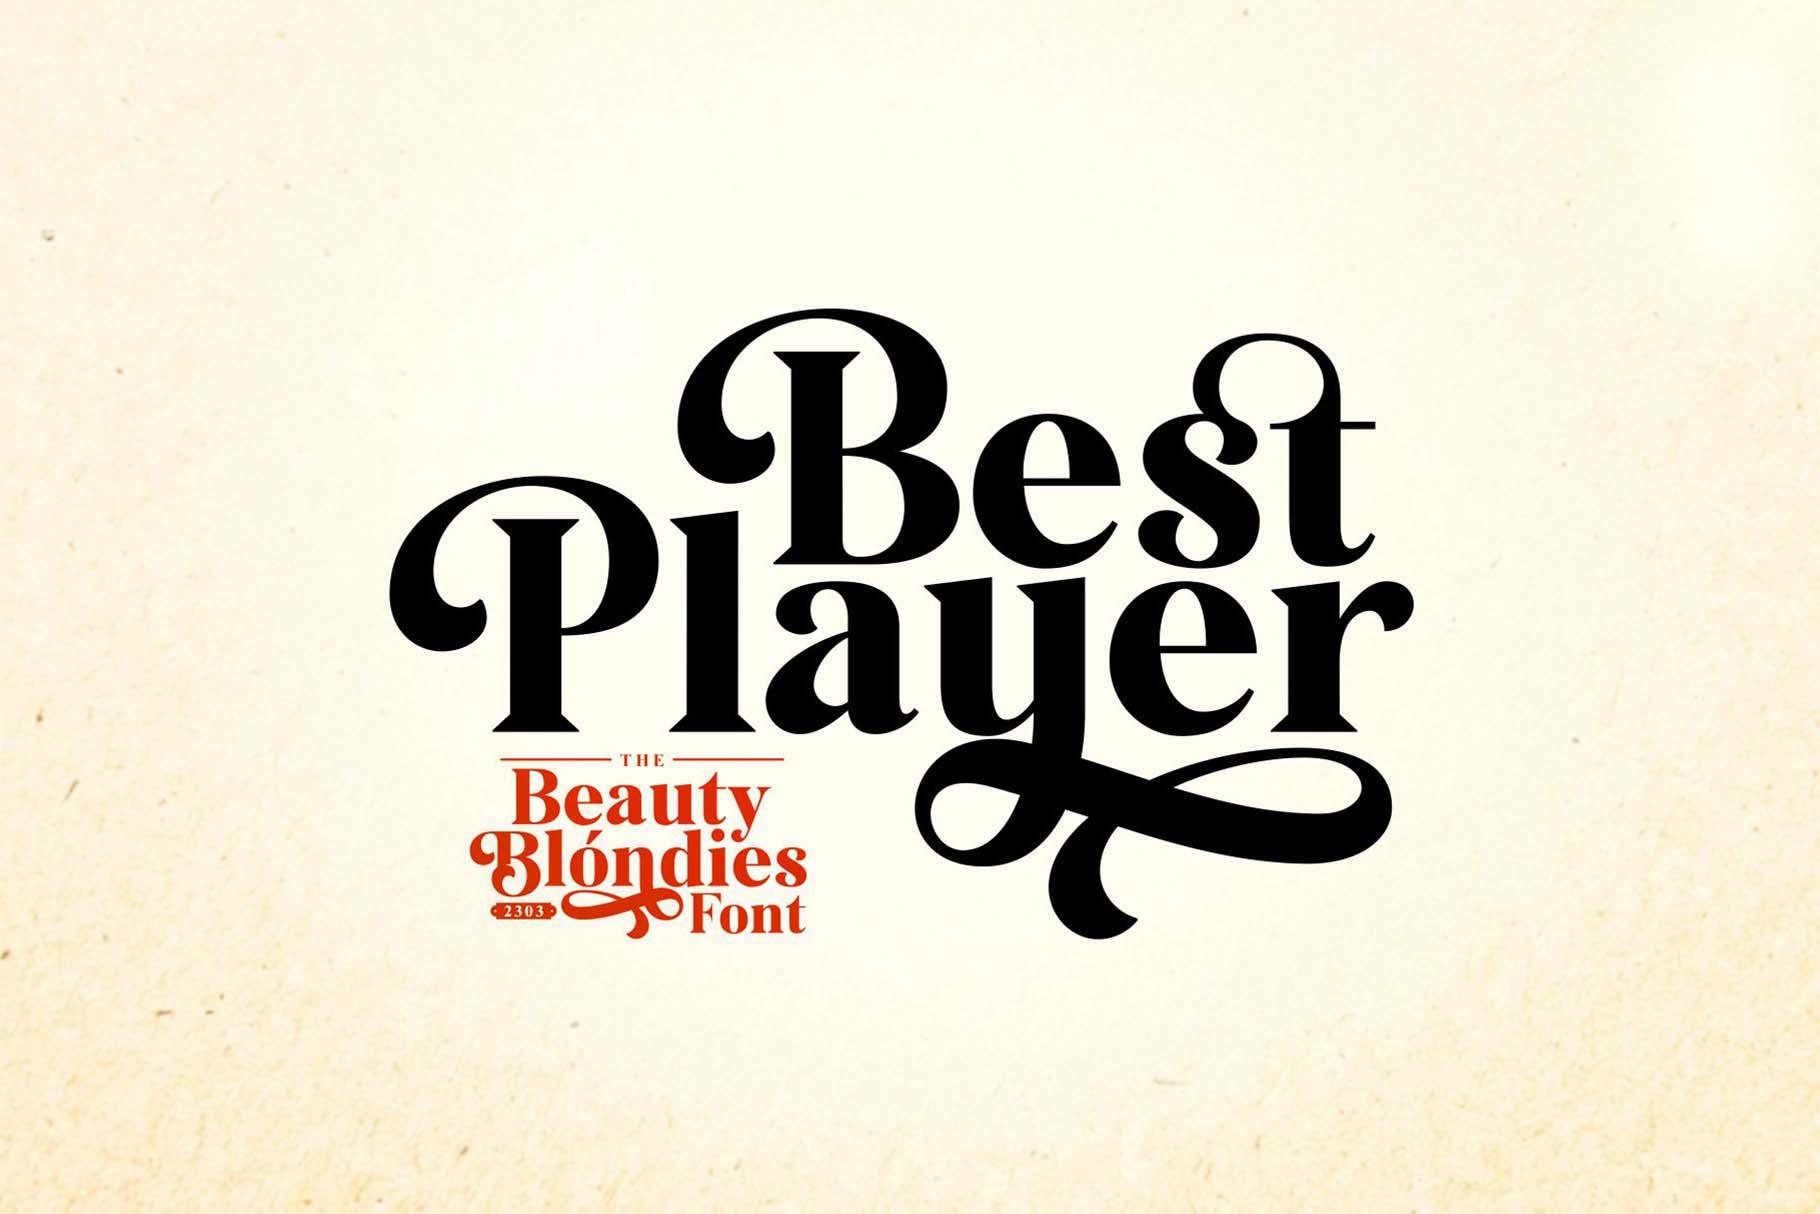 Beauty Blondies Typeface 6